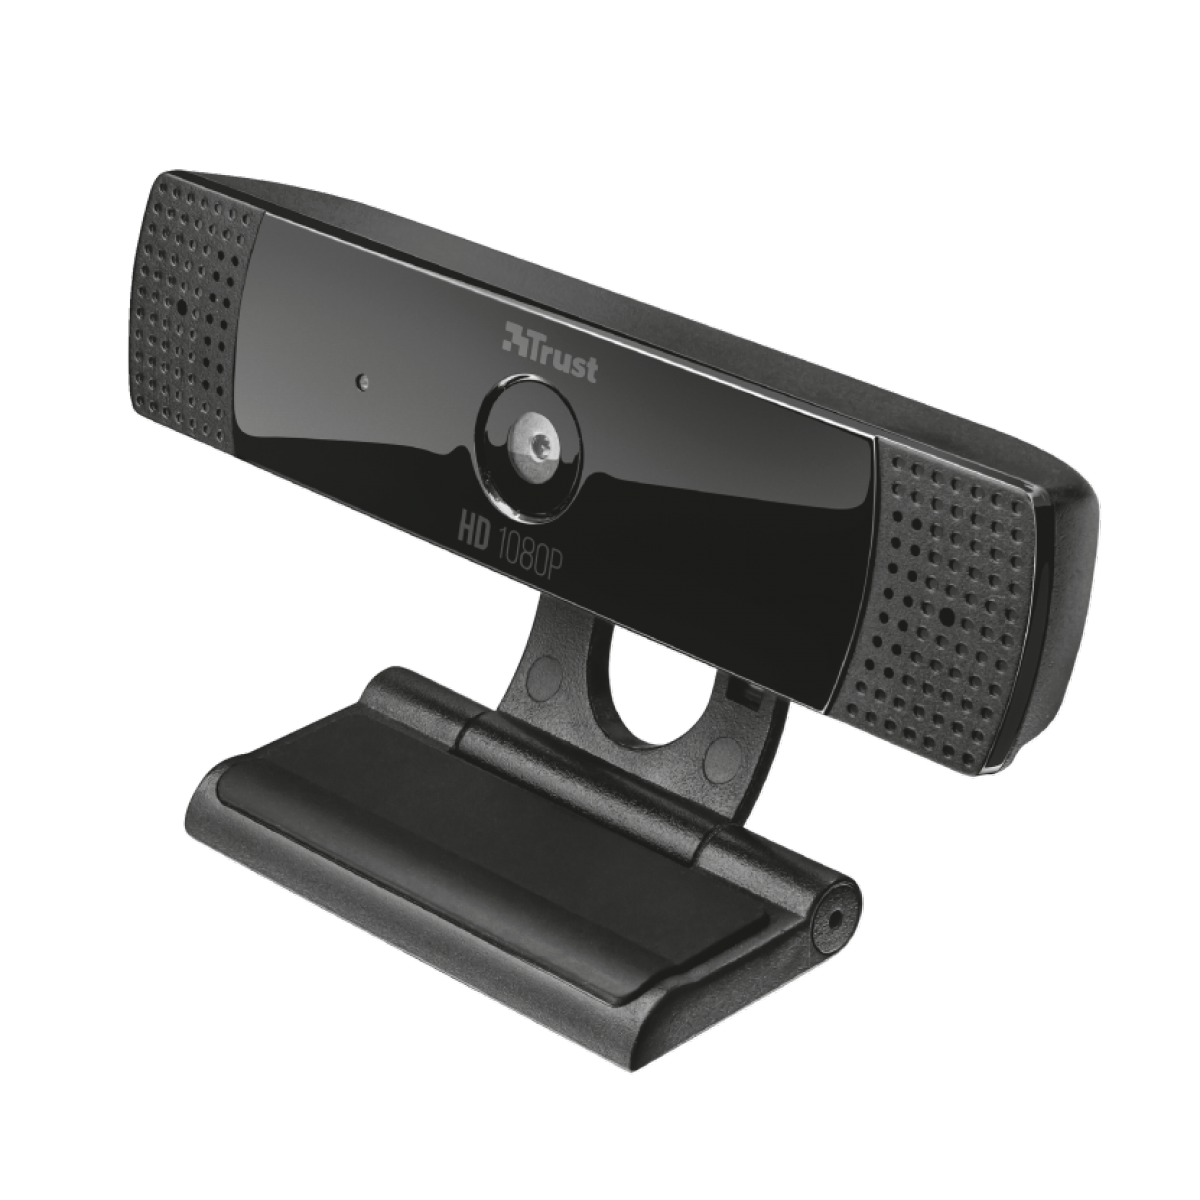 Webcam Trust, GXT 1160 Vero Streaming, Full HD, 1080p, Microfone, T22397